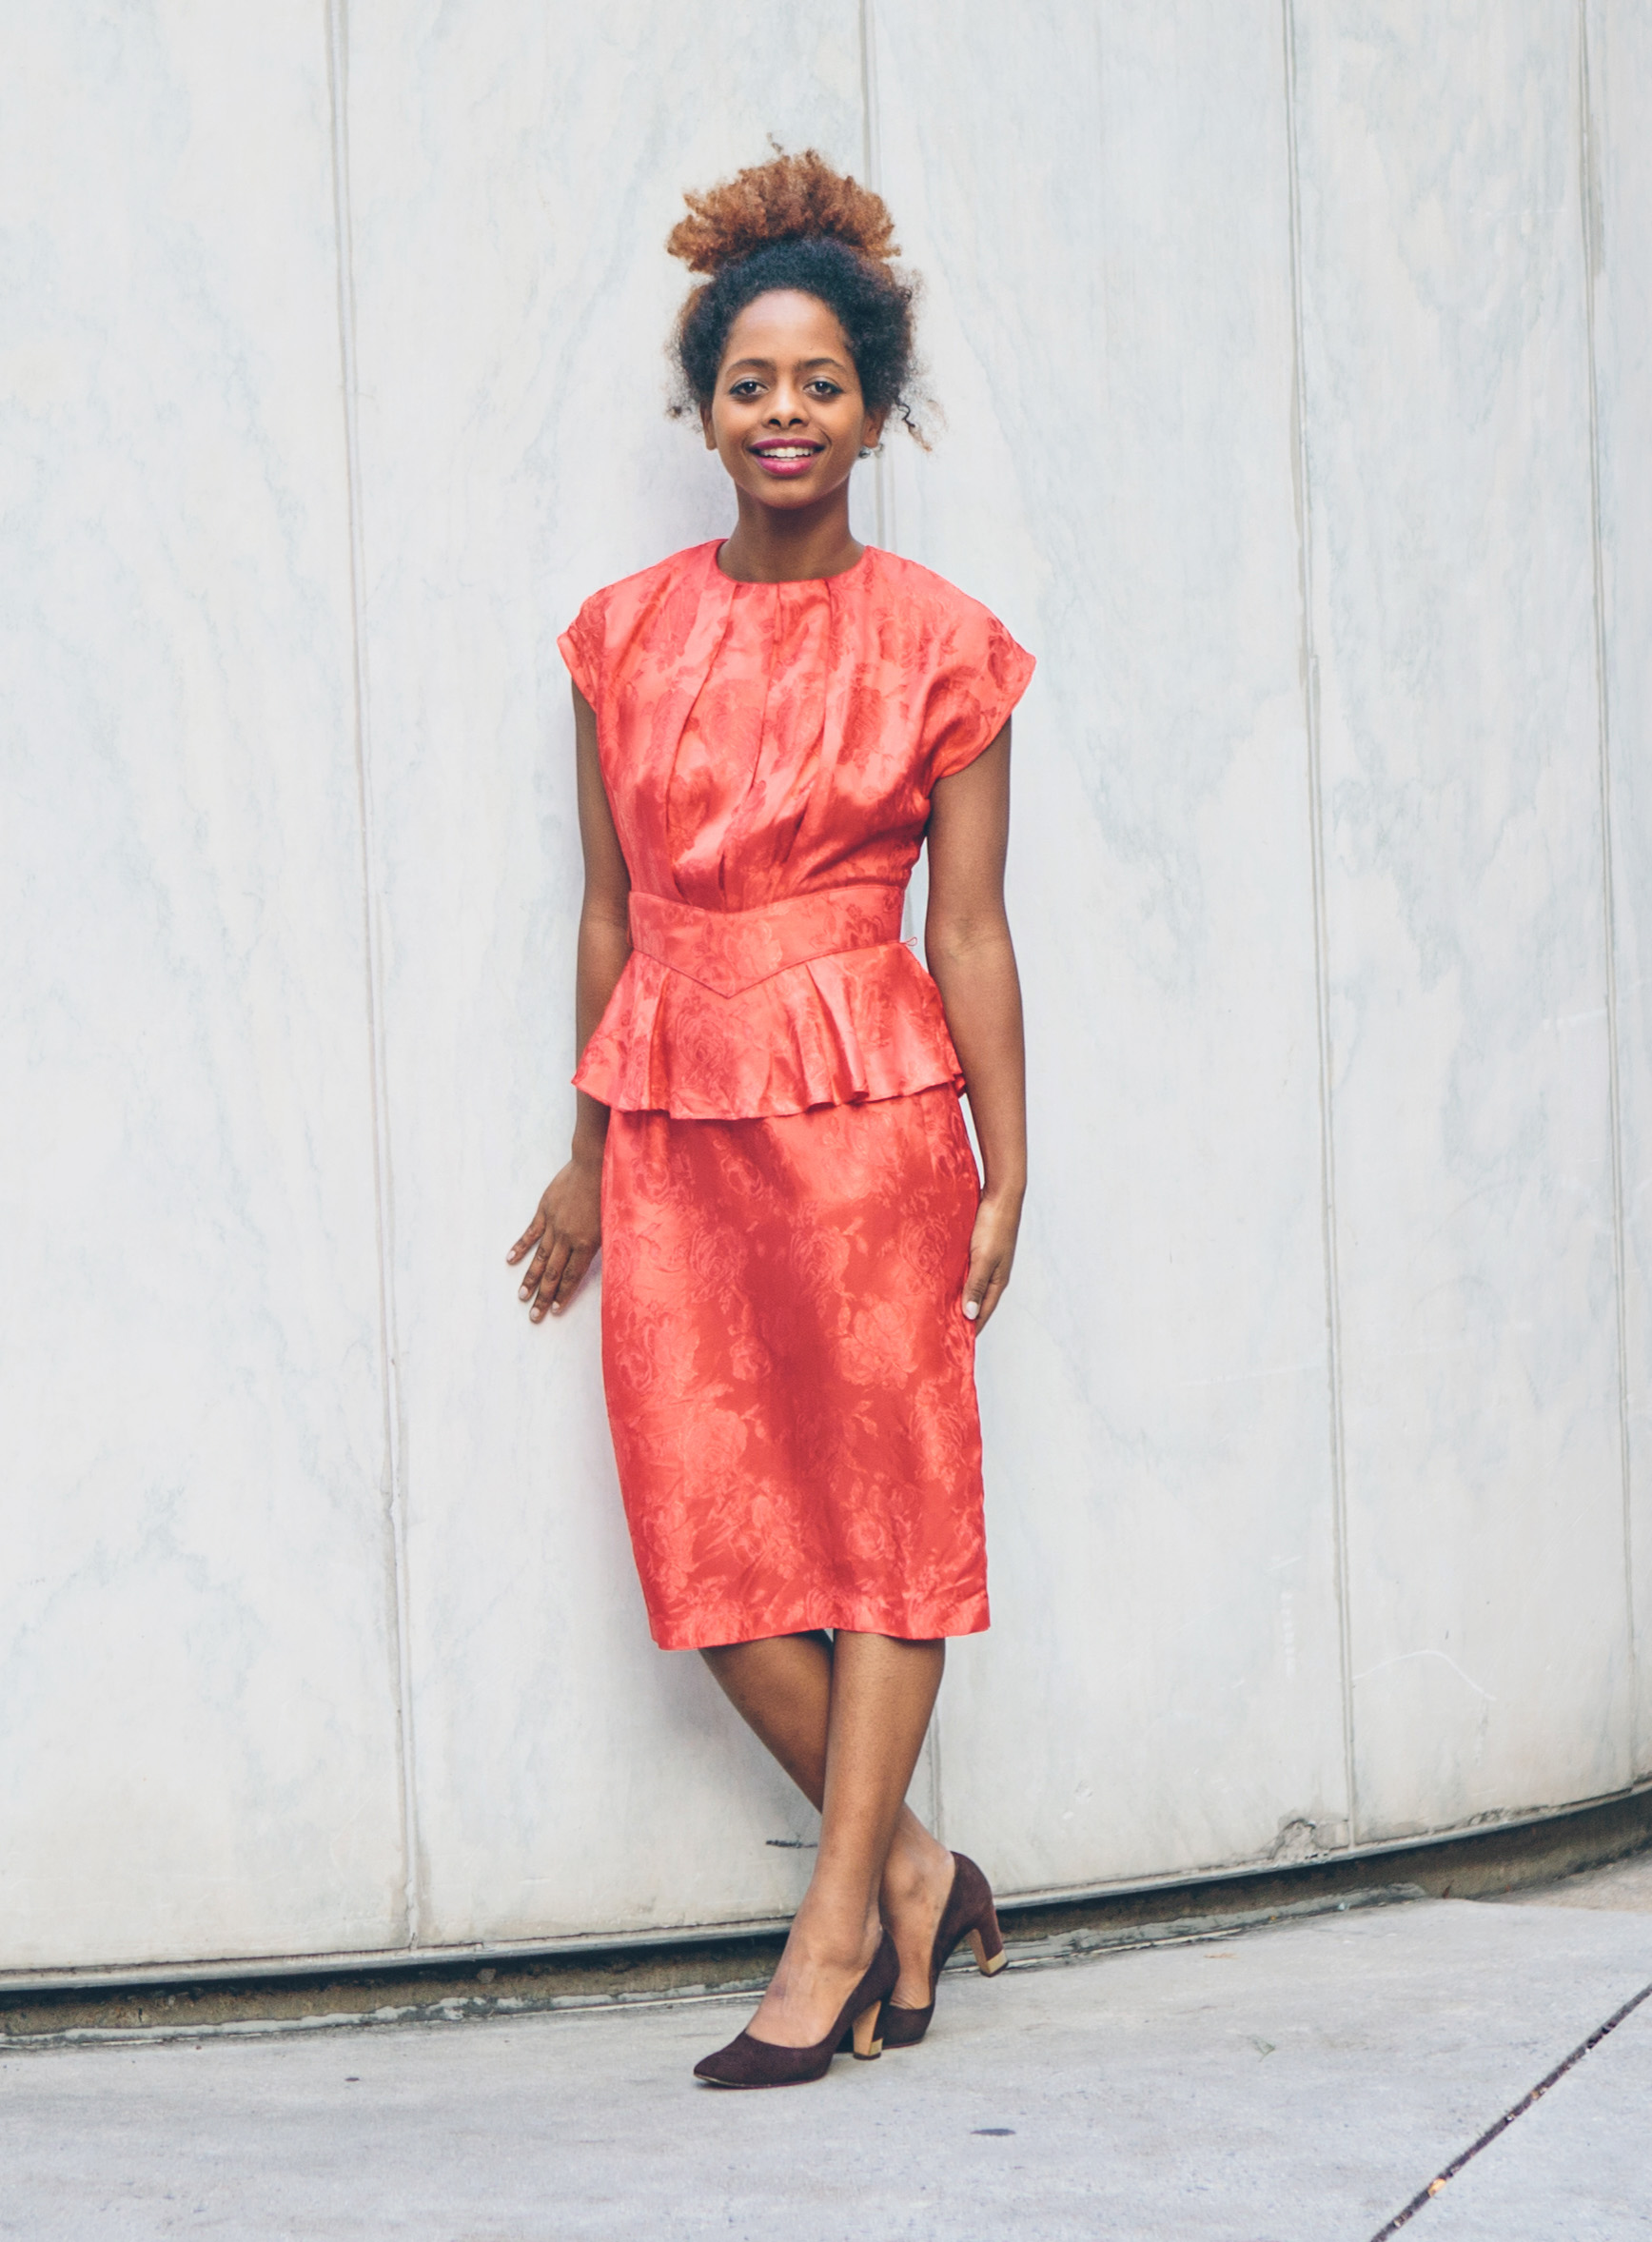 80s red floral peplum dress ($28) | brown suede heels with gold heel detail ($15)